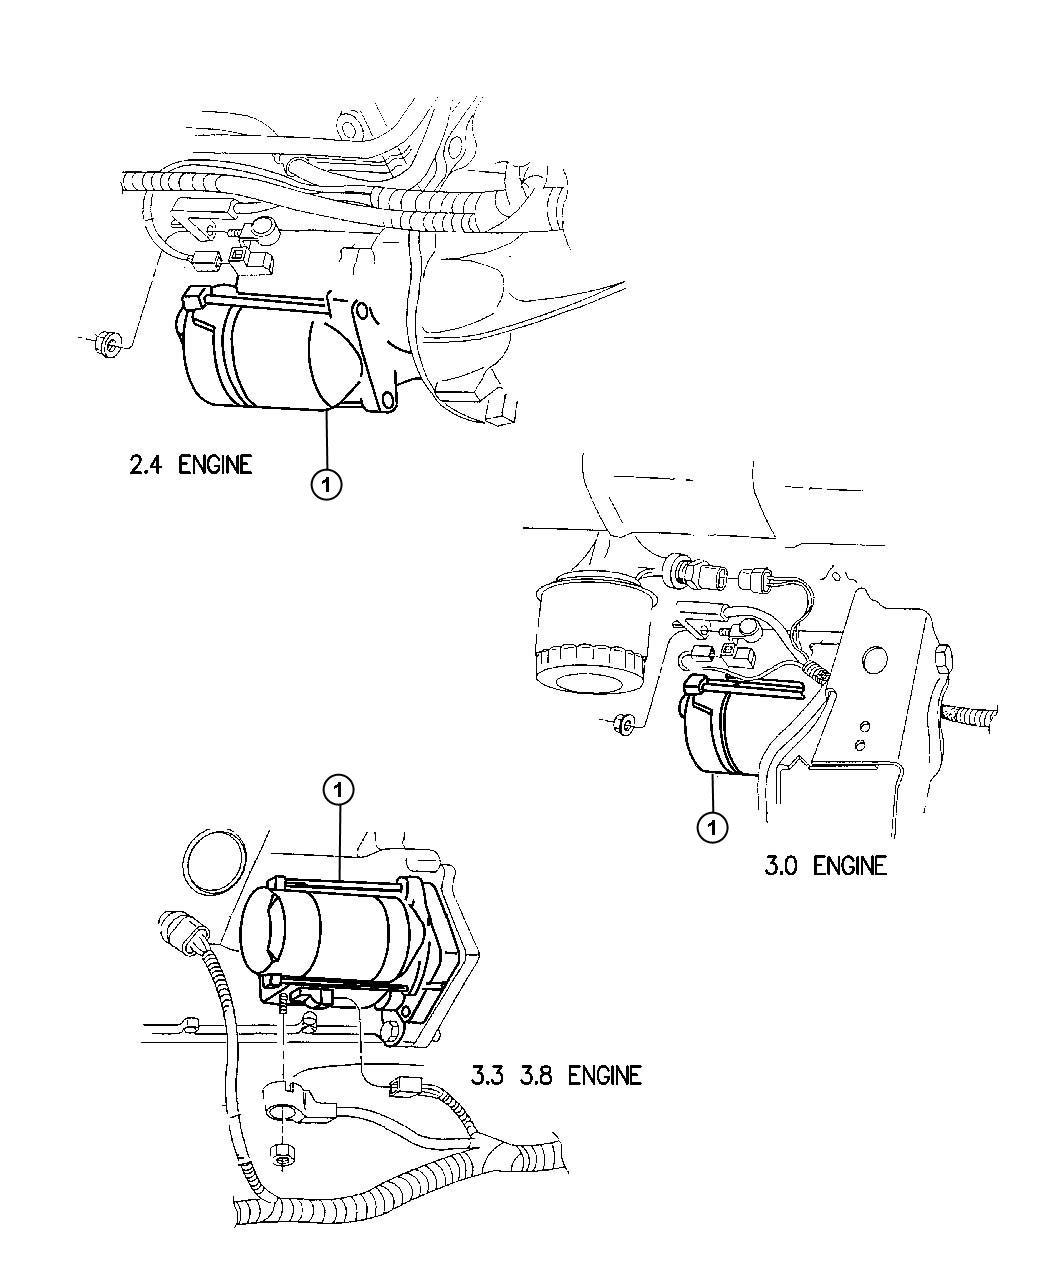 Dodge Neon Starter Engine Remanufactured Federal